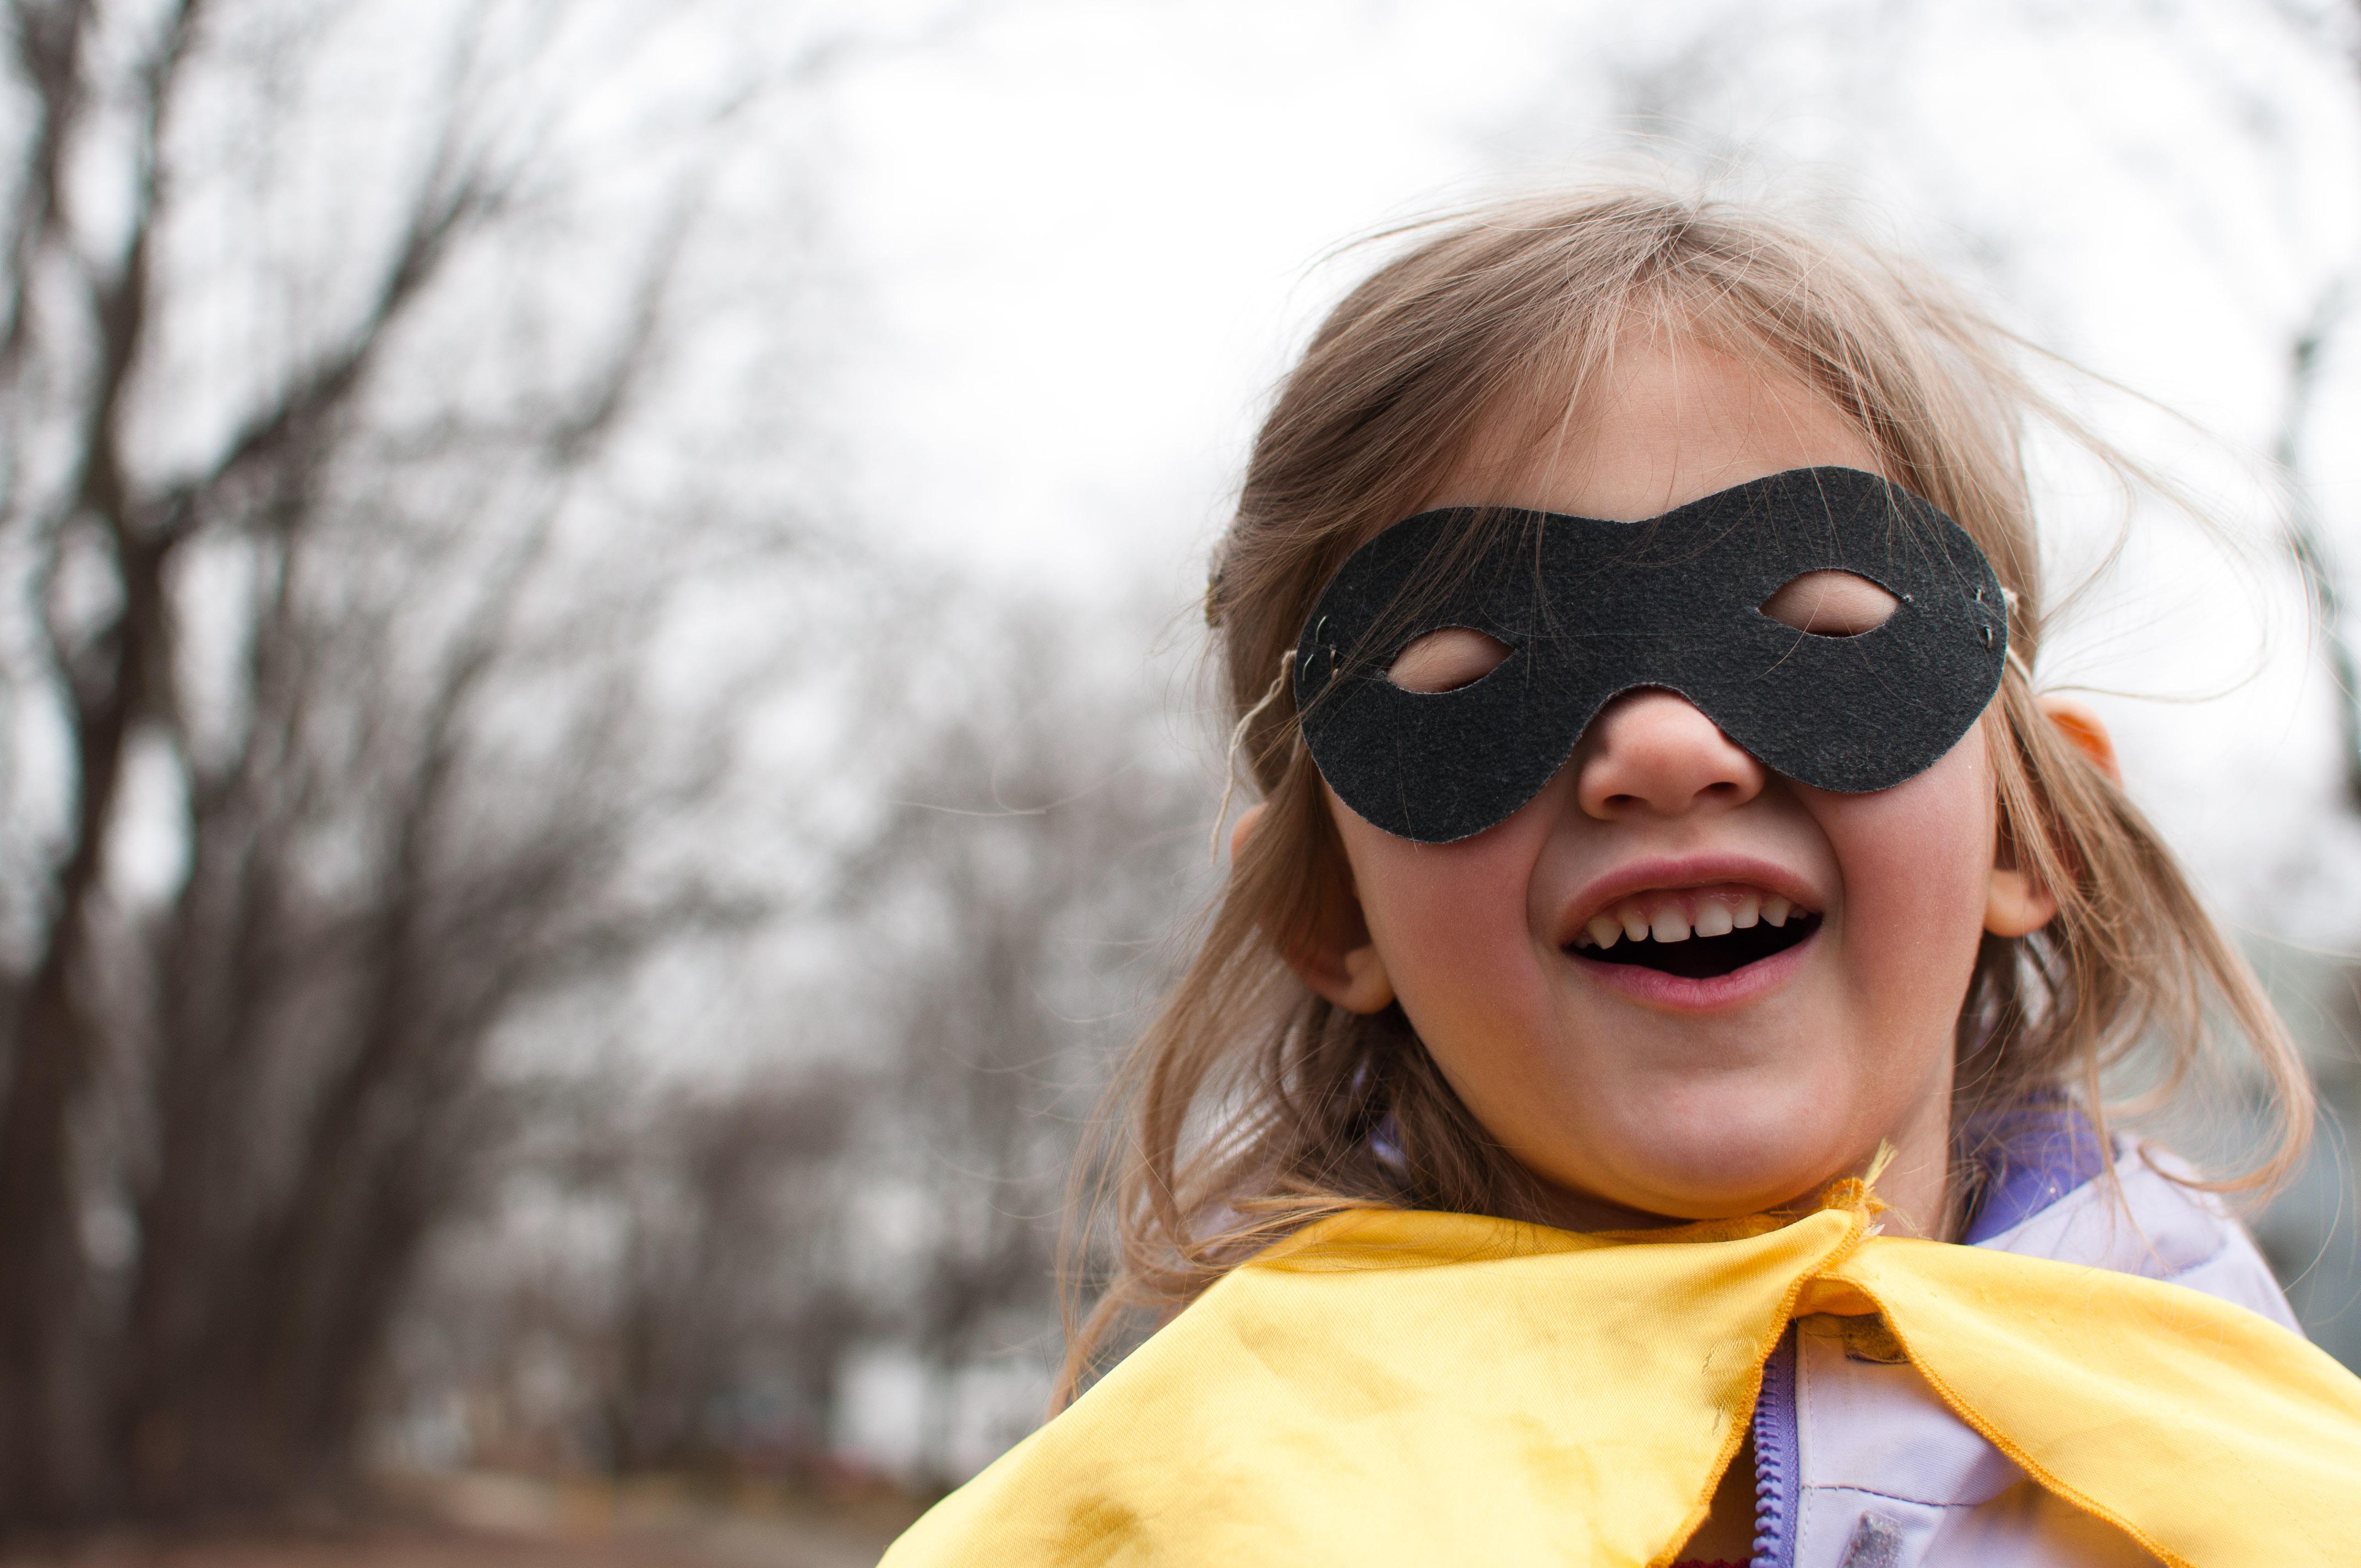 A superhero must hide her identity